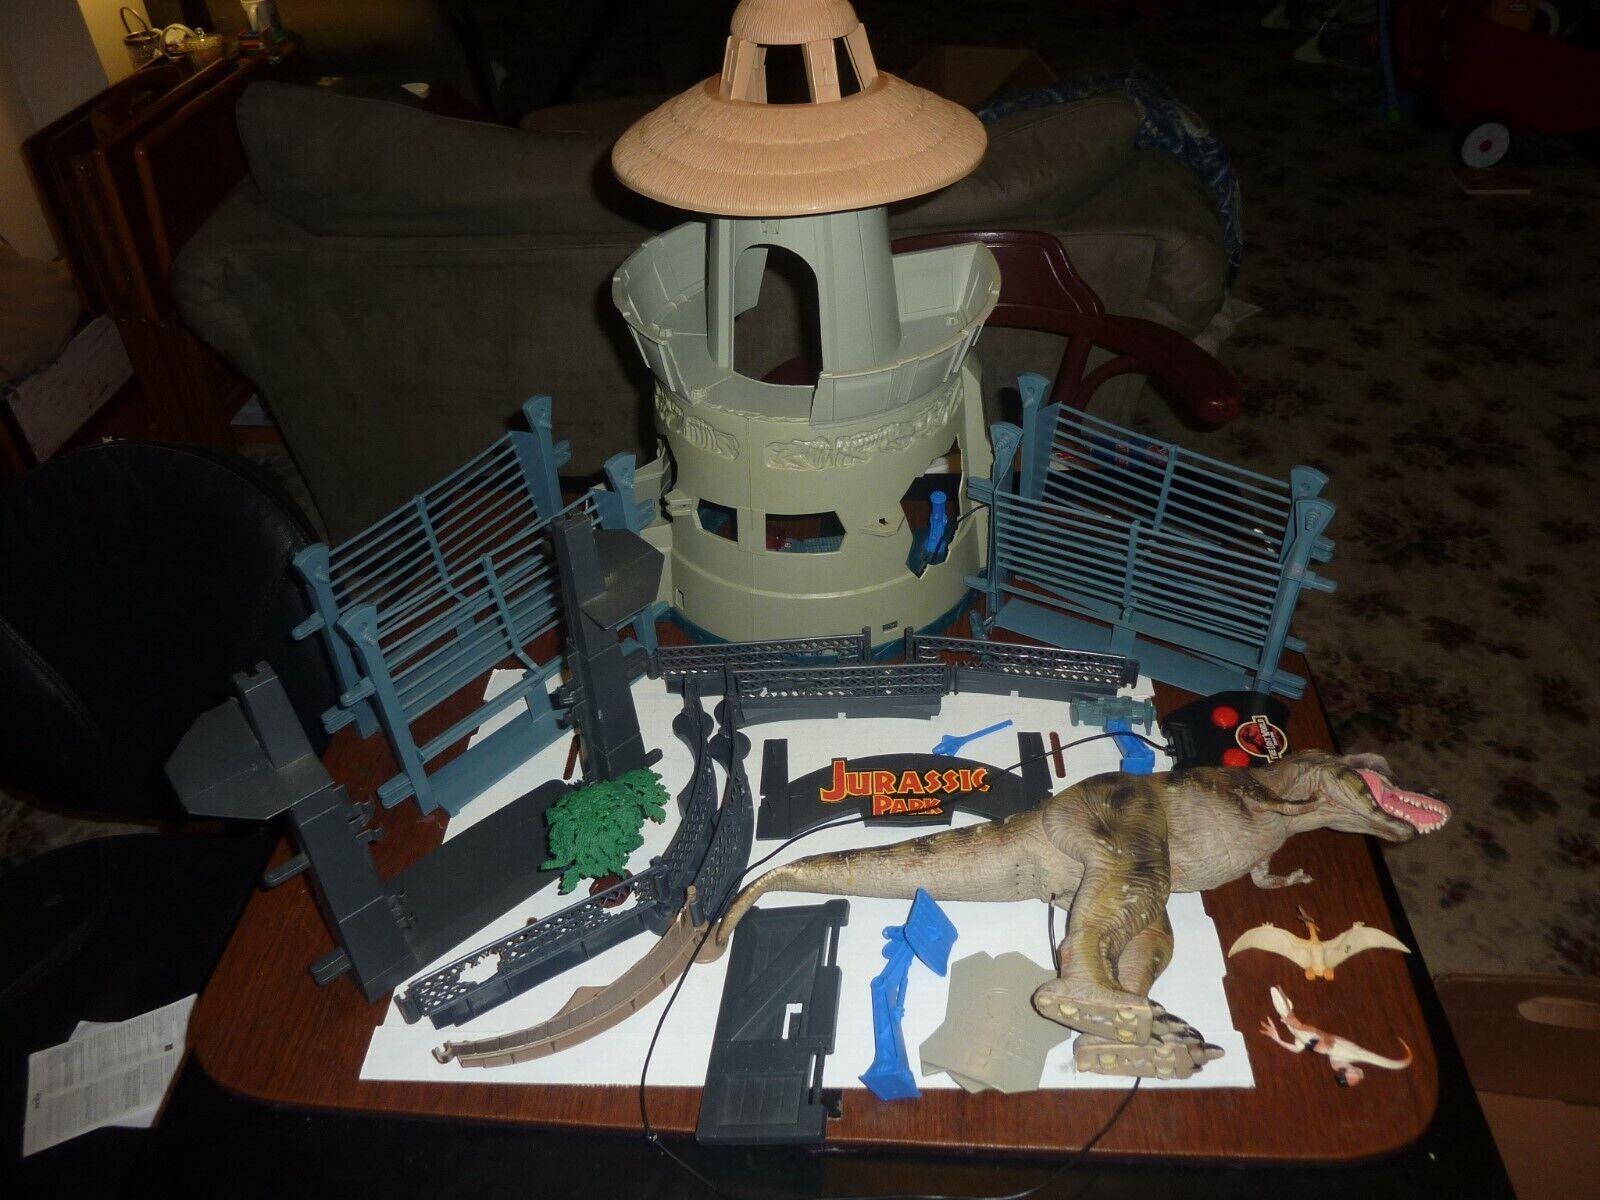 Vintage Jurassic Park Command Compund Playset Kenner w T-Rex Dinosaurs Dinosaurs Dinosaurs Parts 3919d8